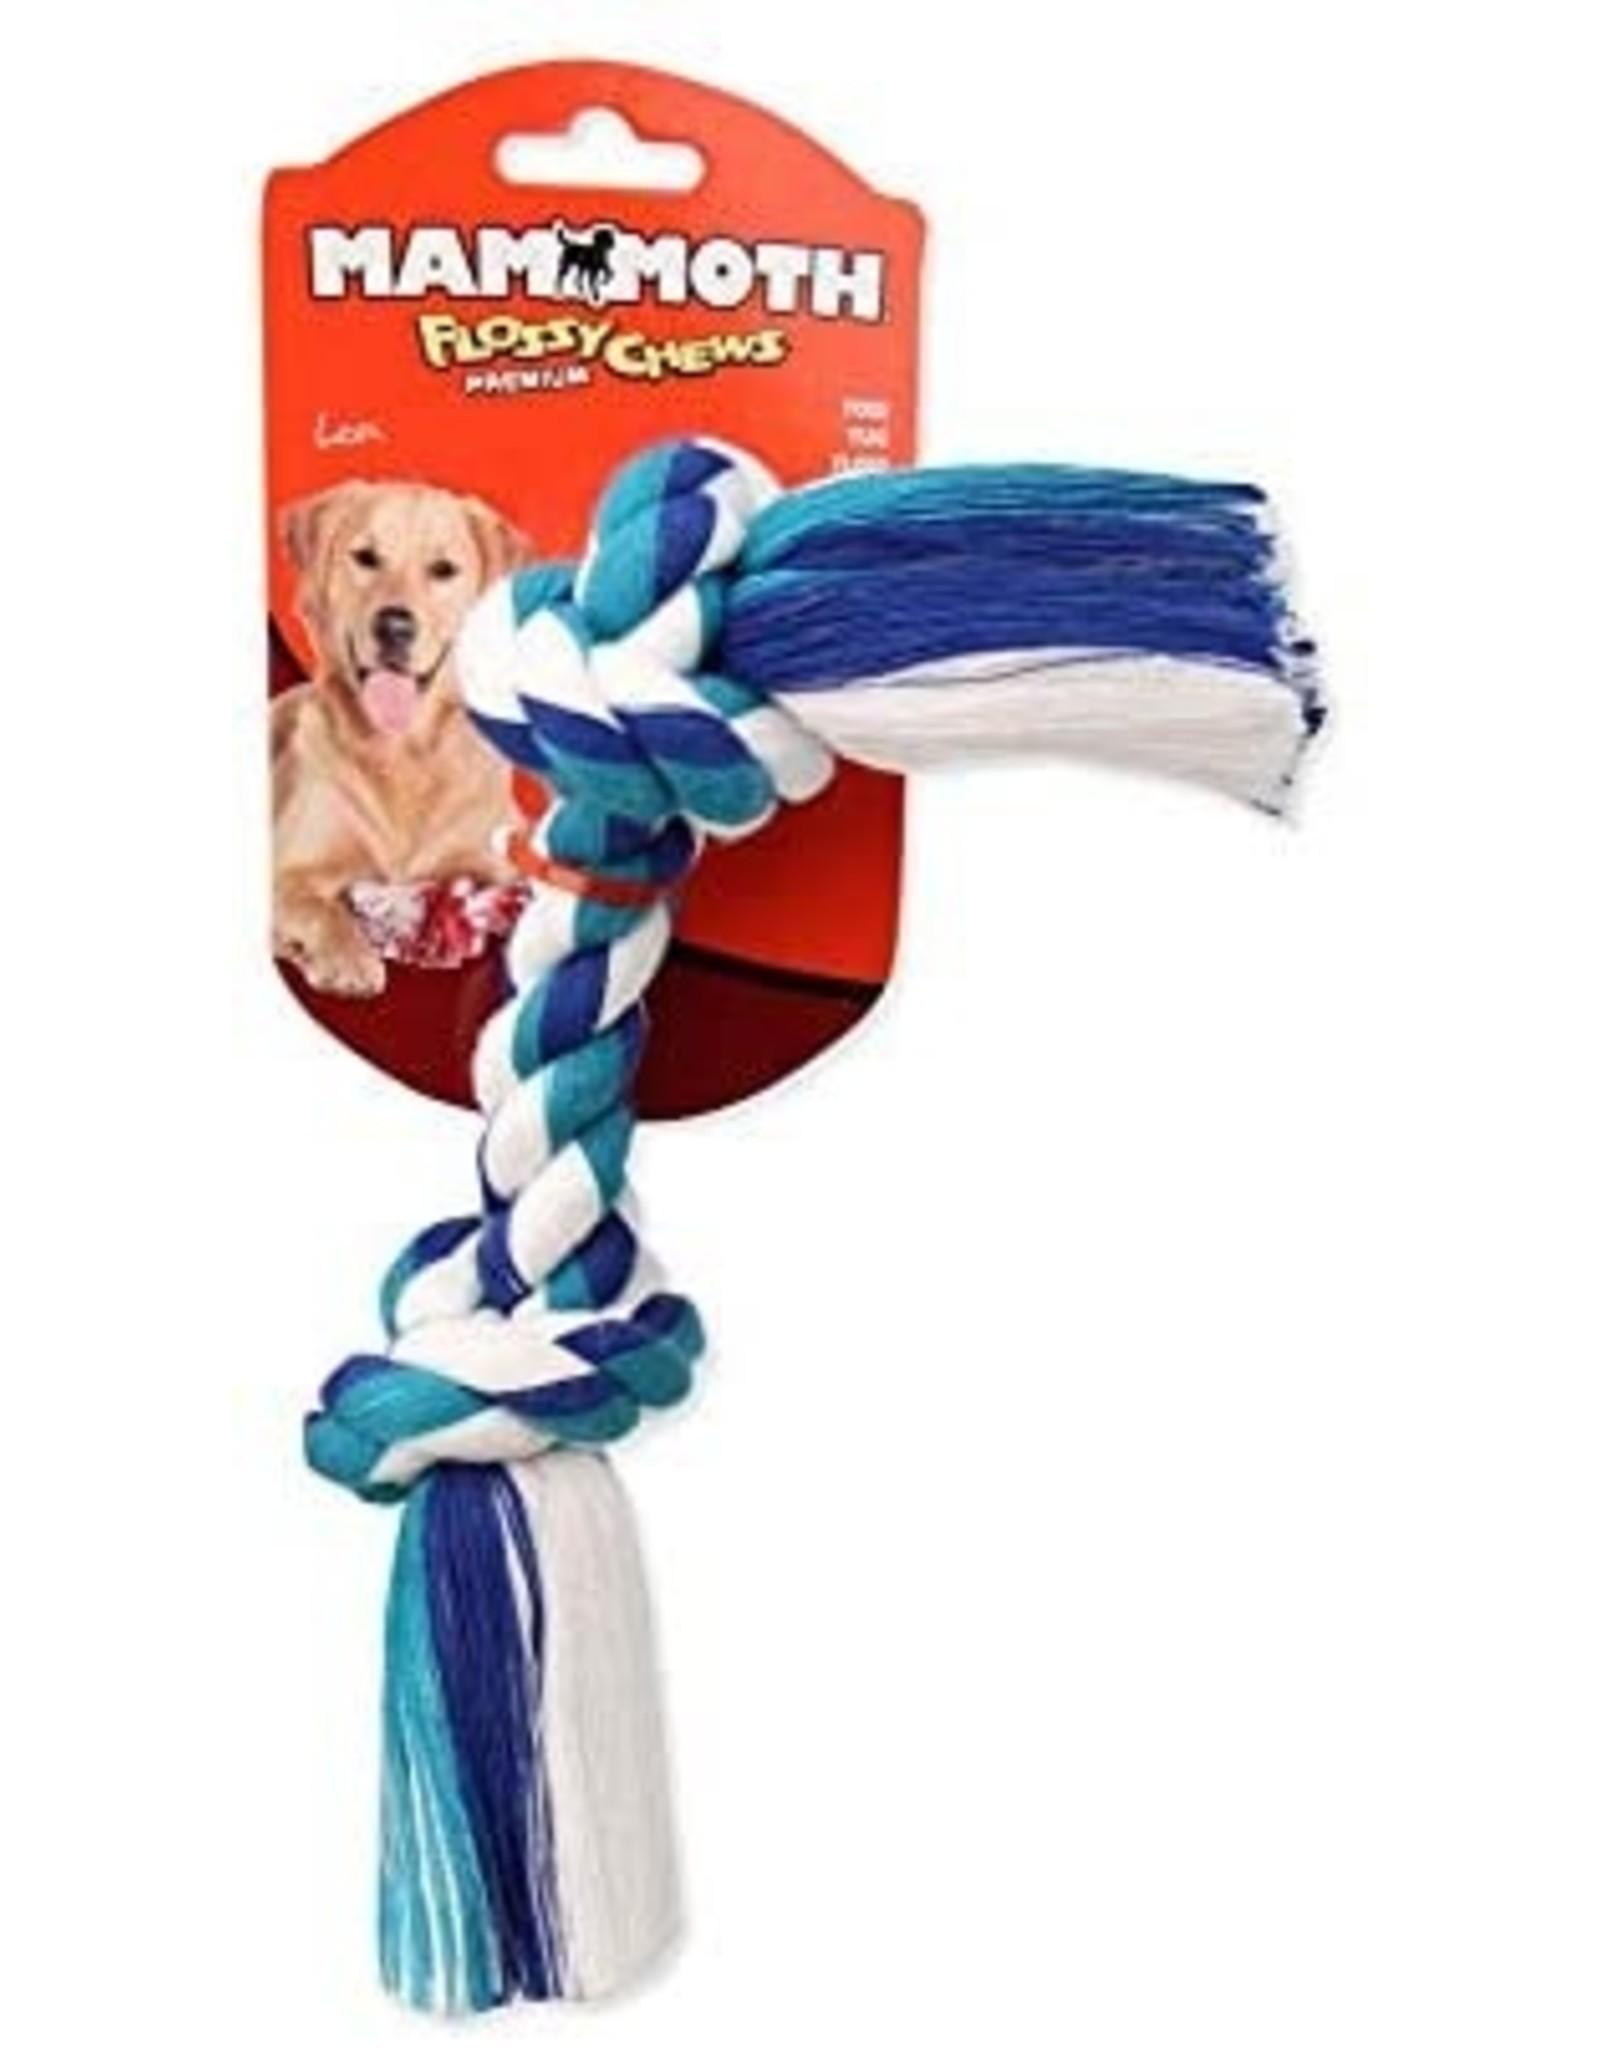 Mammoth  Flossy Chews Dog Toy Tug Rope Bone Mini 6in